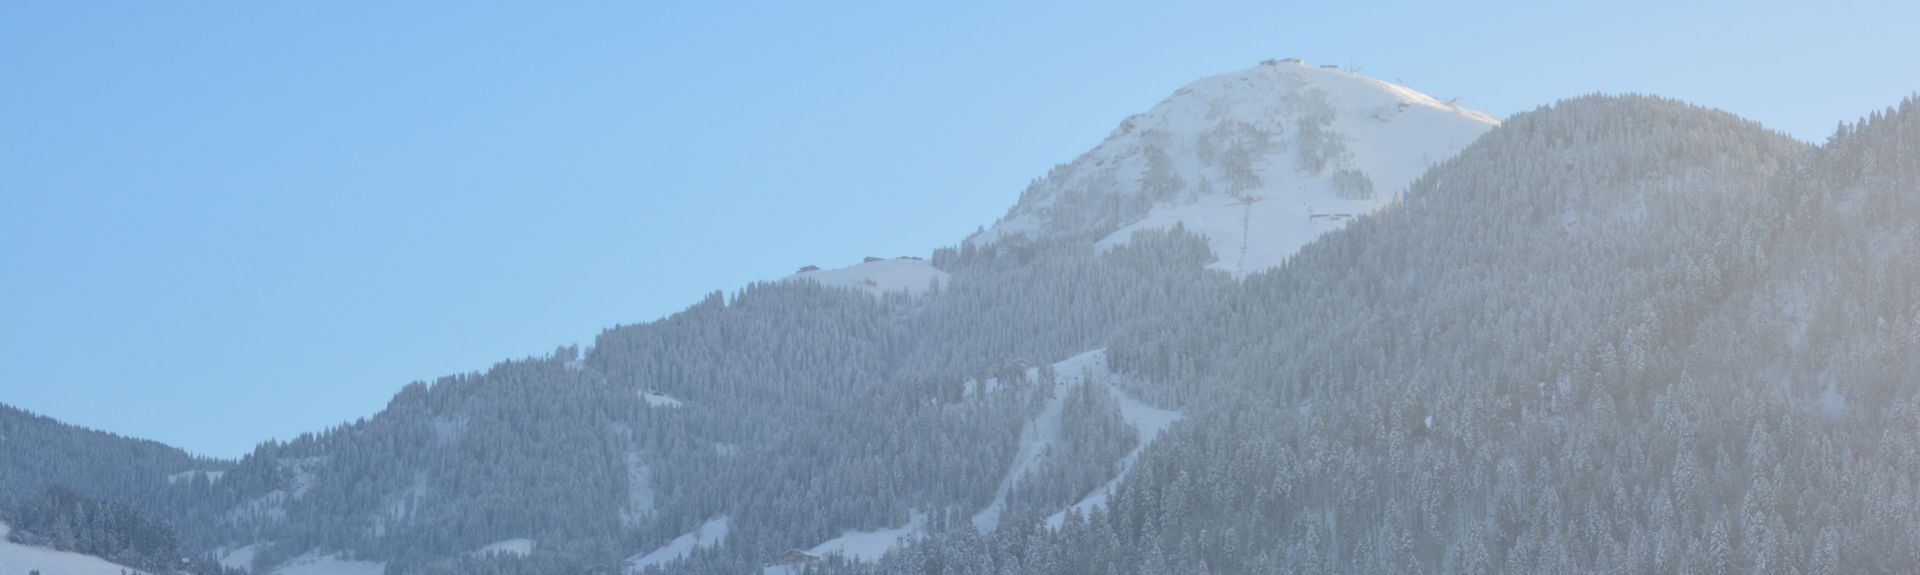 Laerchfilzen Ski Lift, Fieberbrunn, Austria